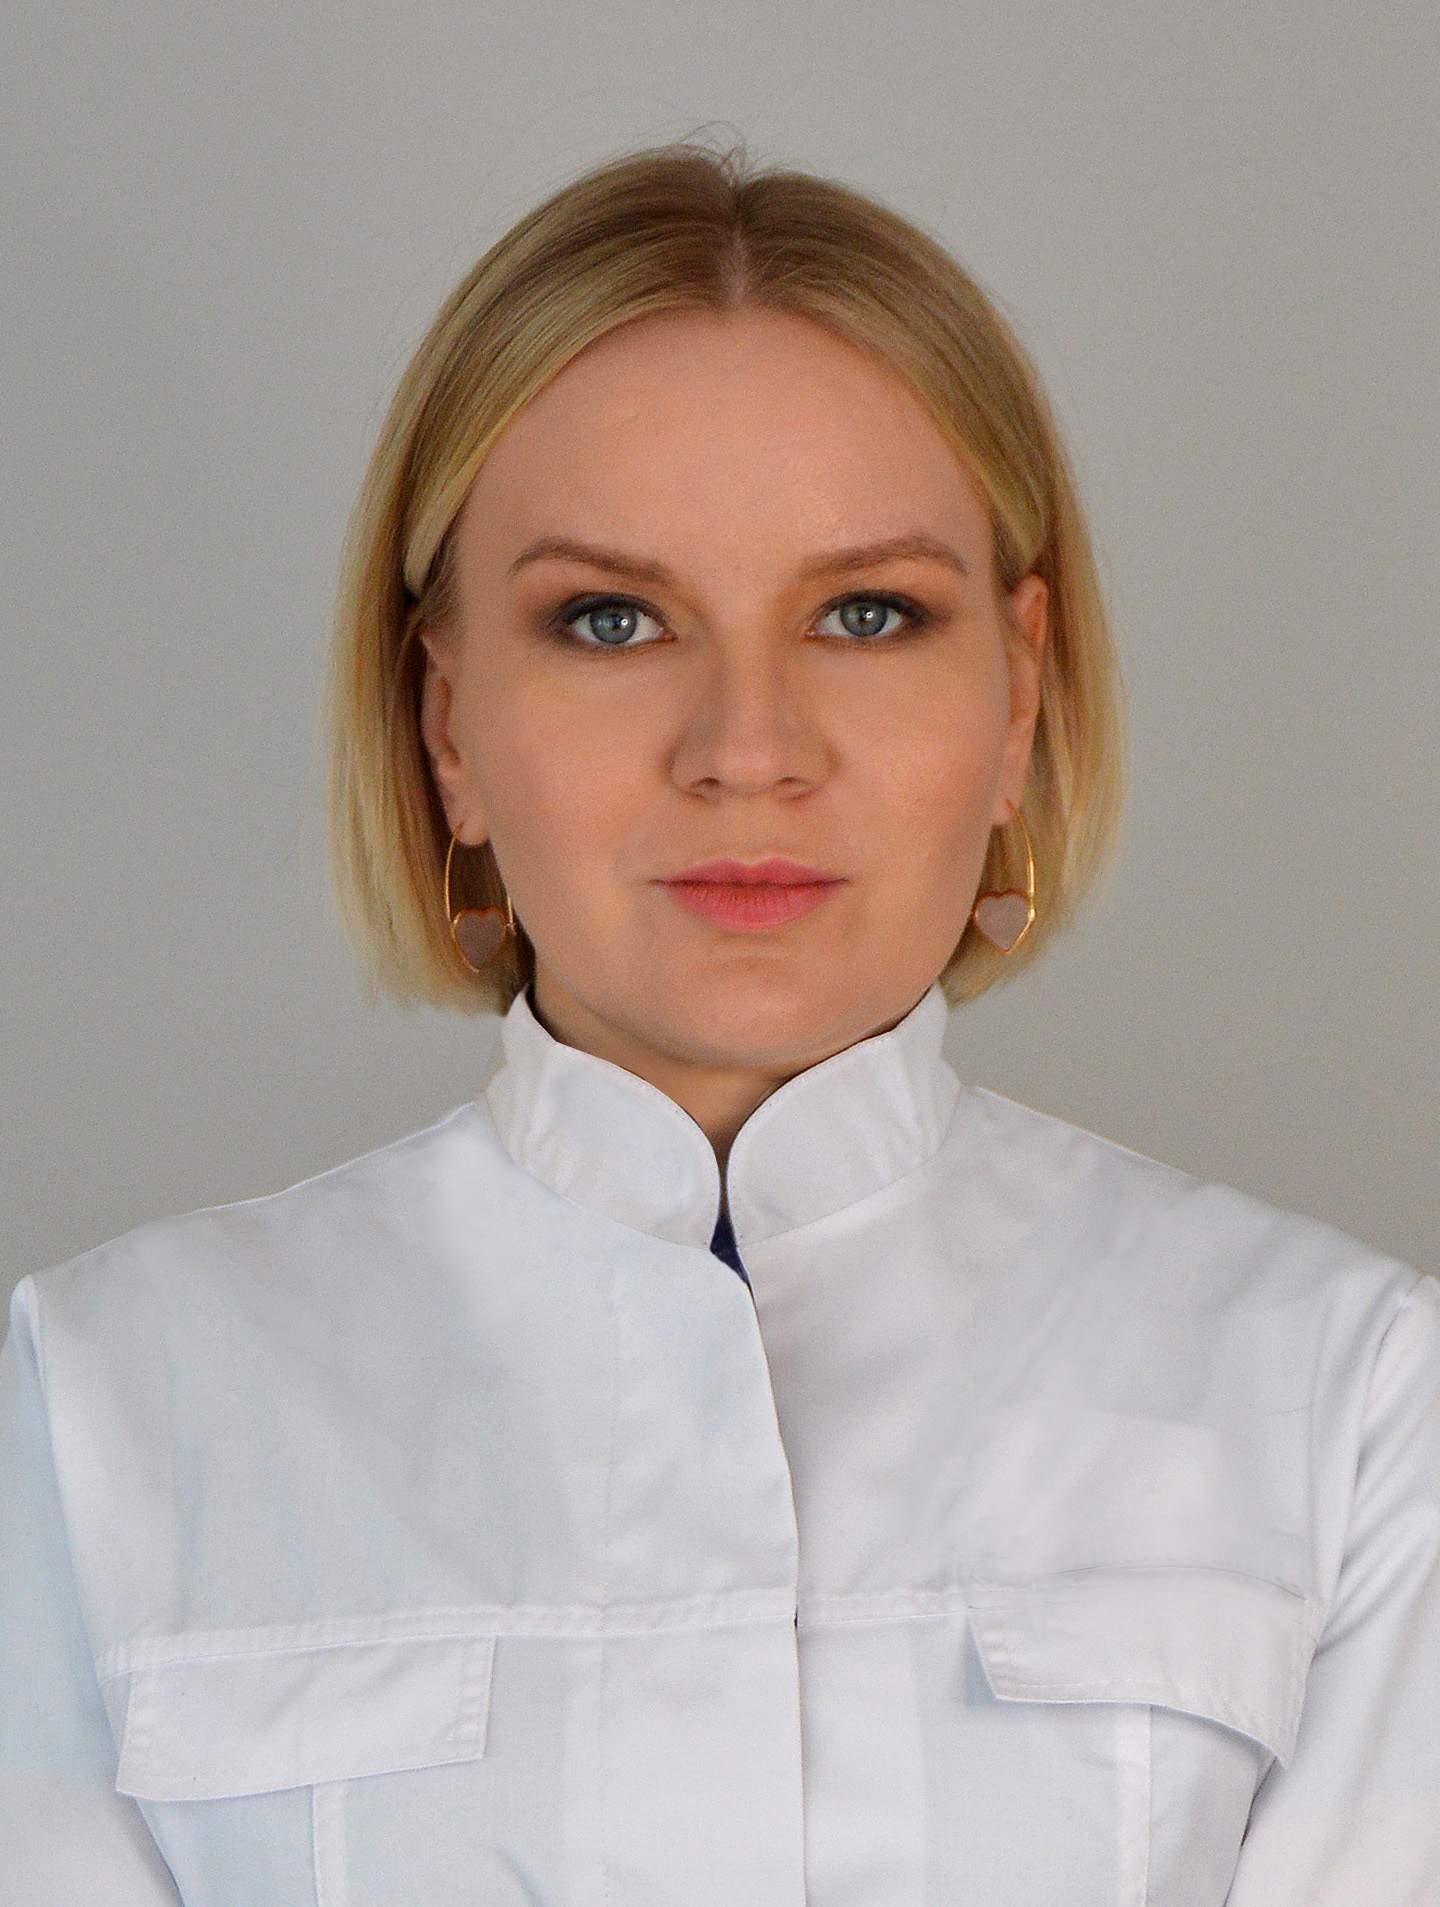 Струкова Ольга Олеговна